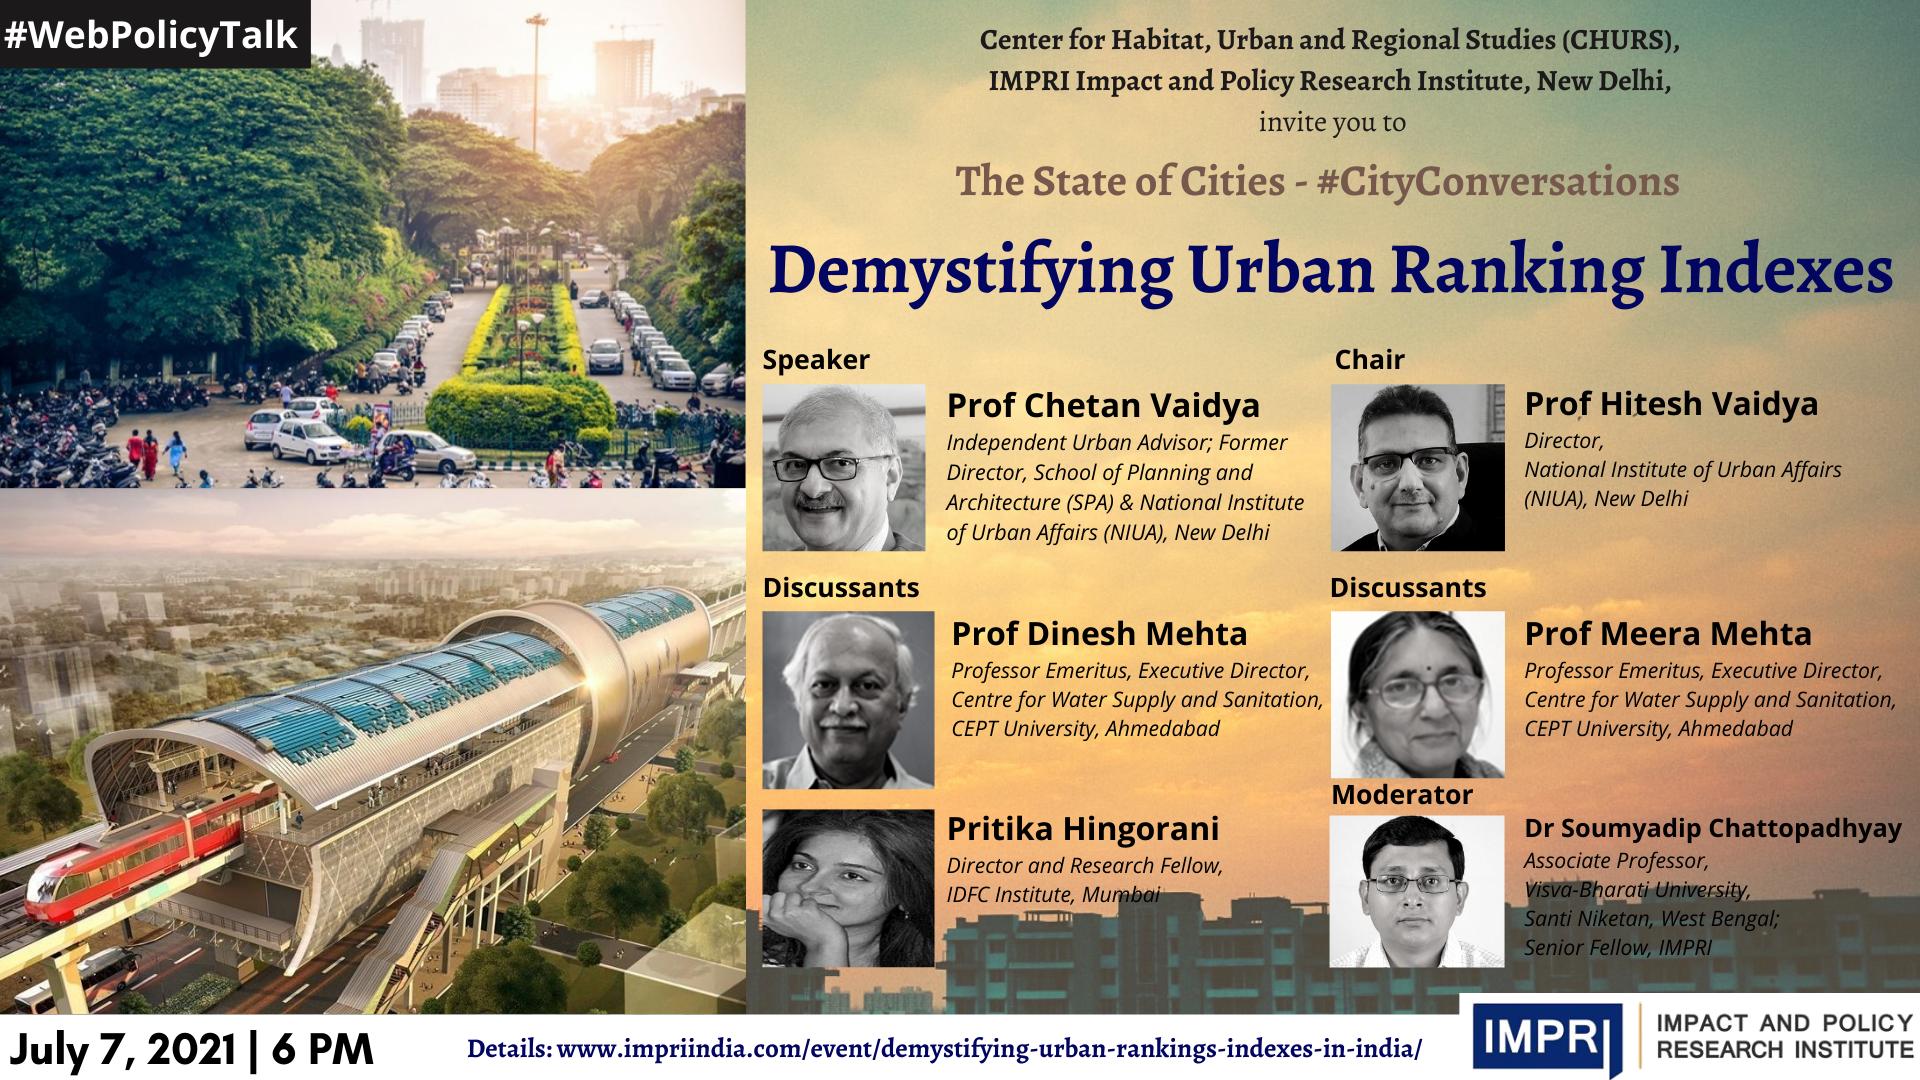 Demystifying Urban Ranking Indexes in India